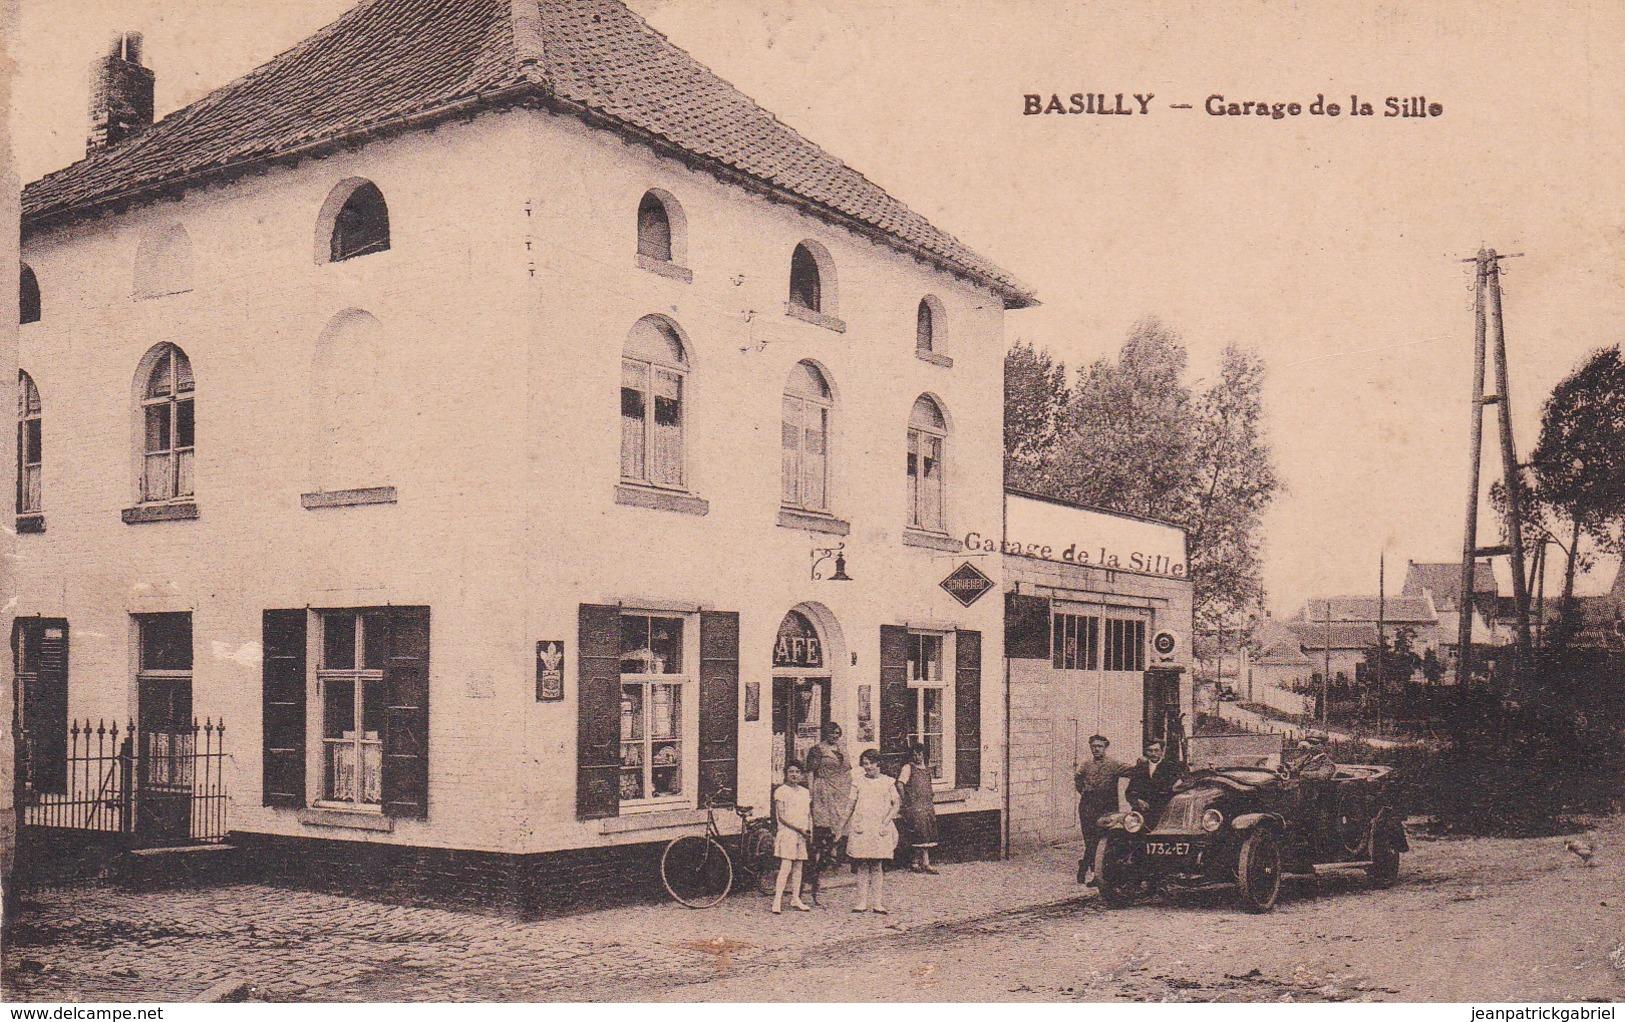 619 Bassilly Garage De La Sille - Bélgica